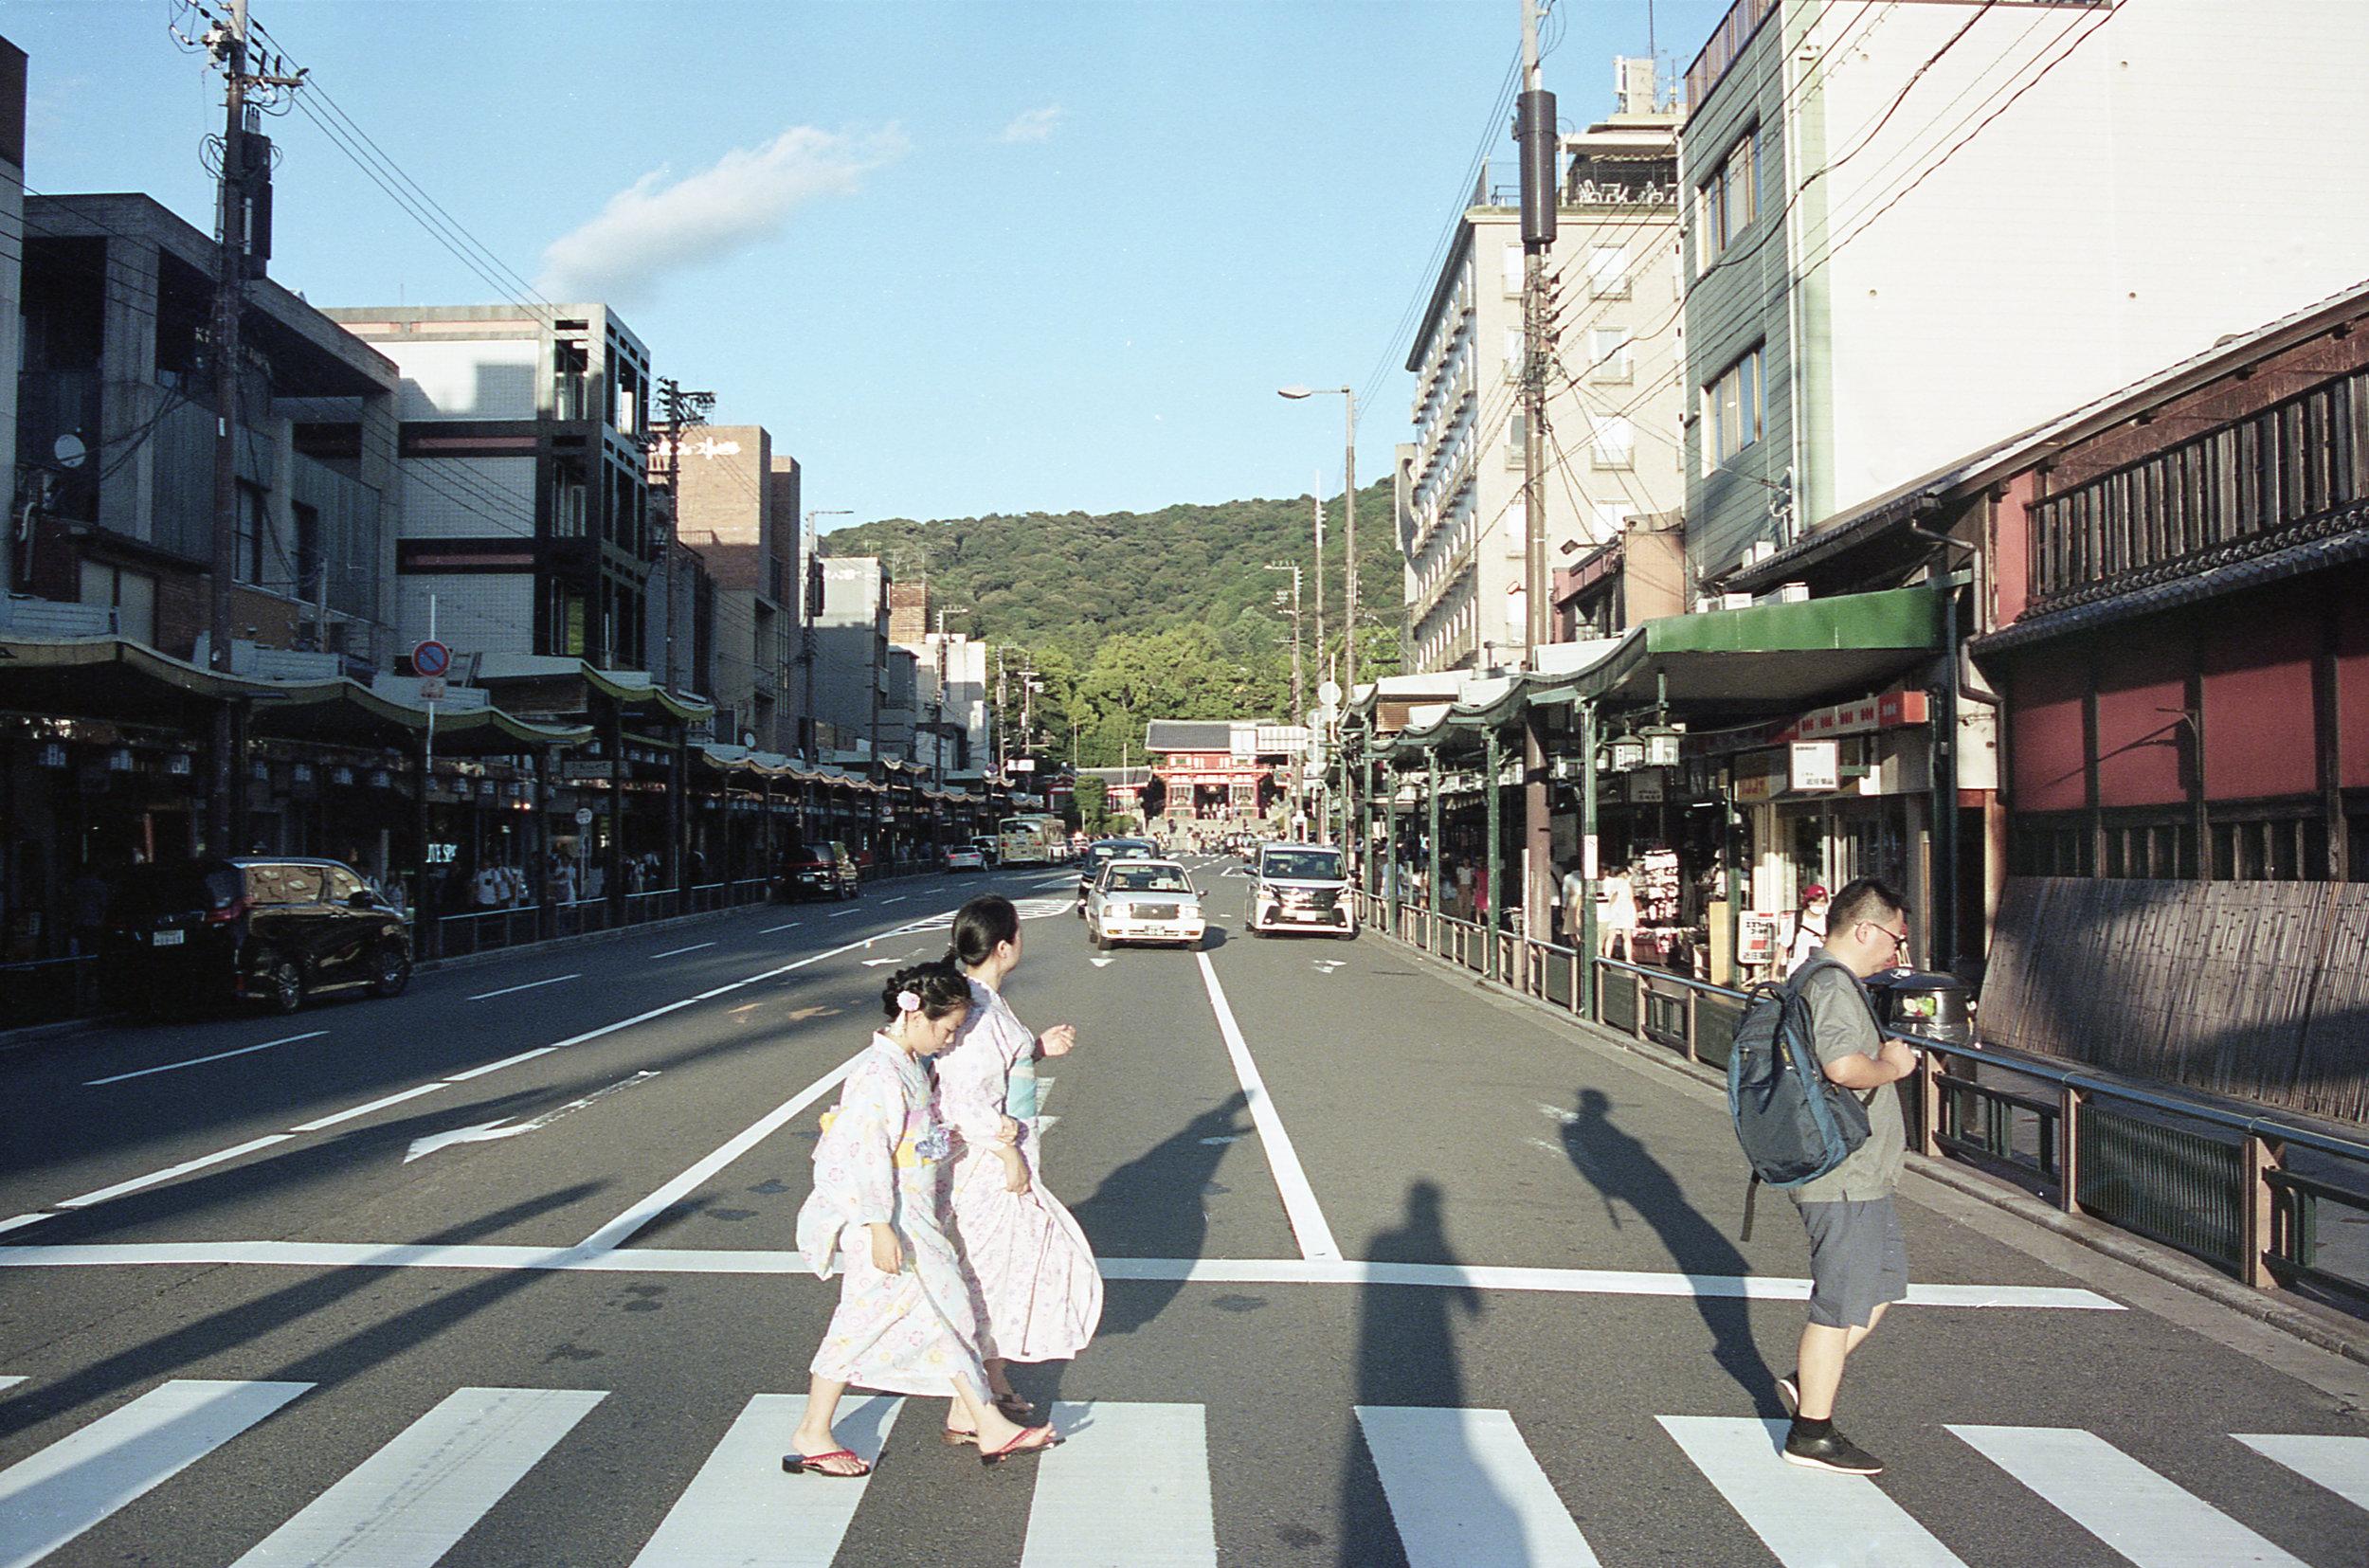 20180825_Train_Kyo_040.jpg